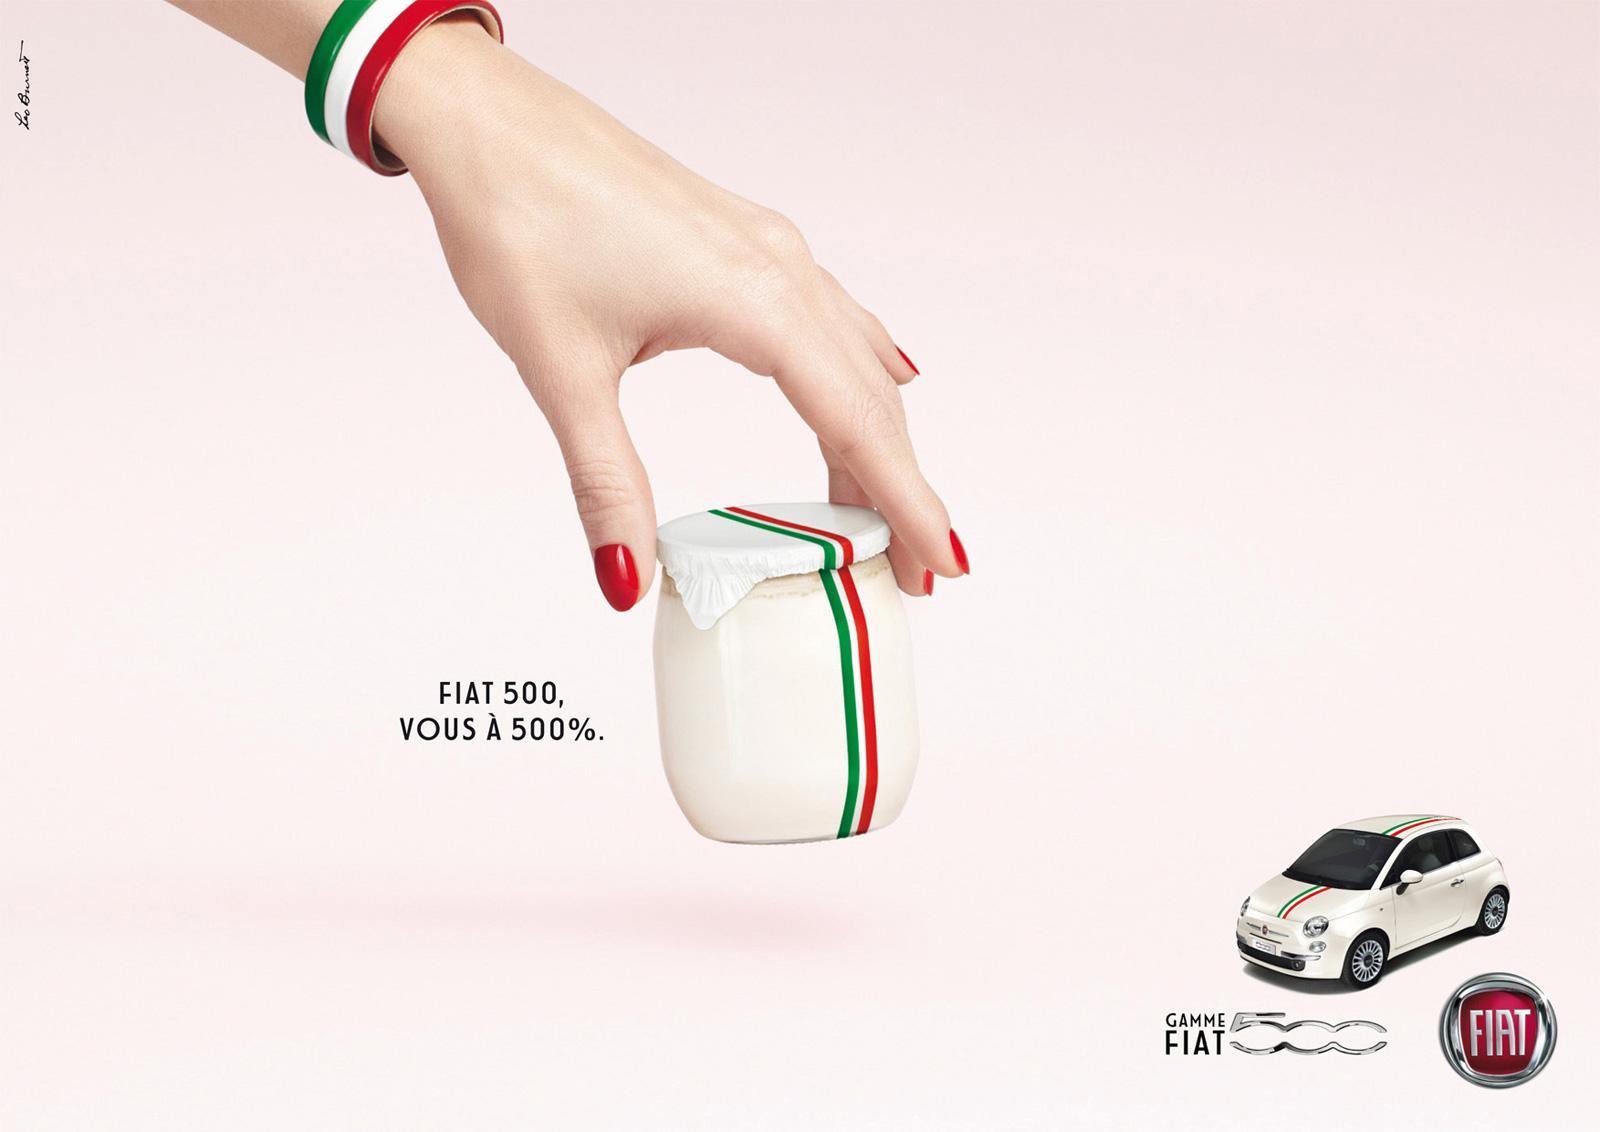 print ad leo burnett. Fiat Print Ad - Hands, Italy Leo Burnett ;